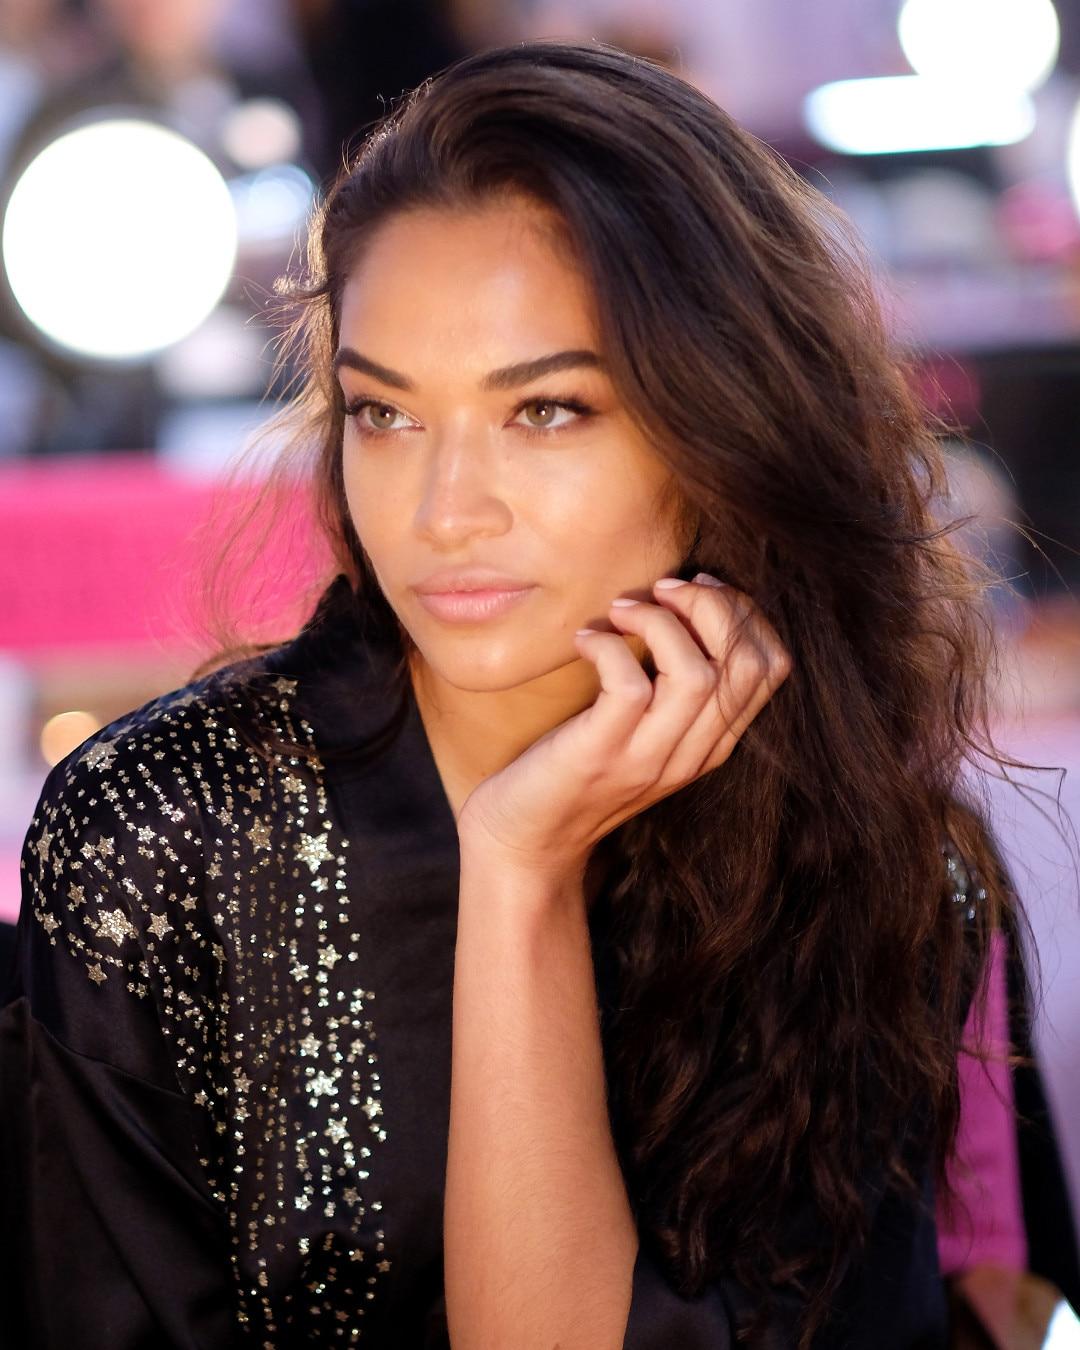 ESC: Victoria's Secret, Shanina Shaik